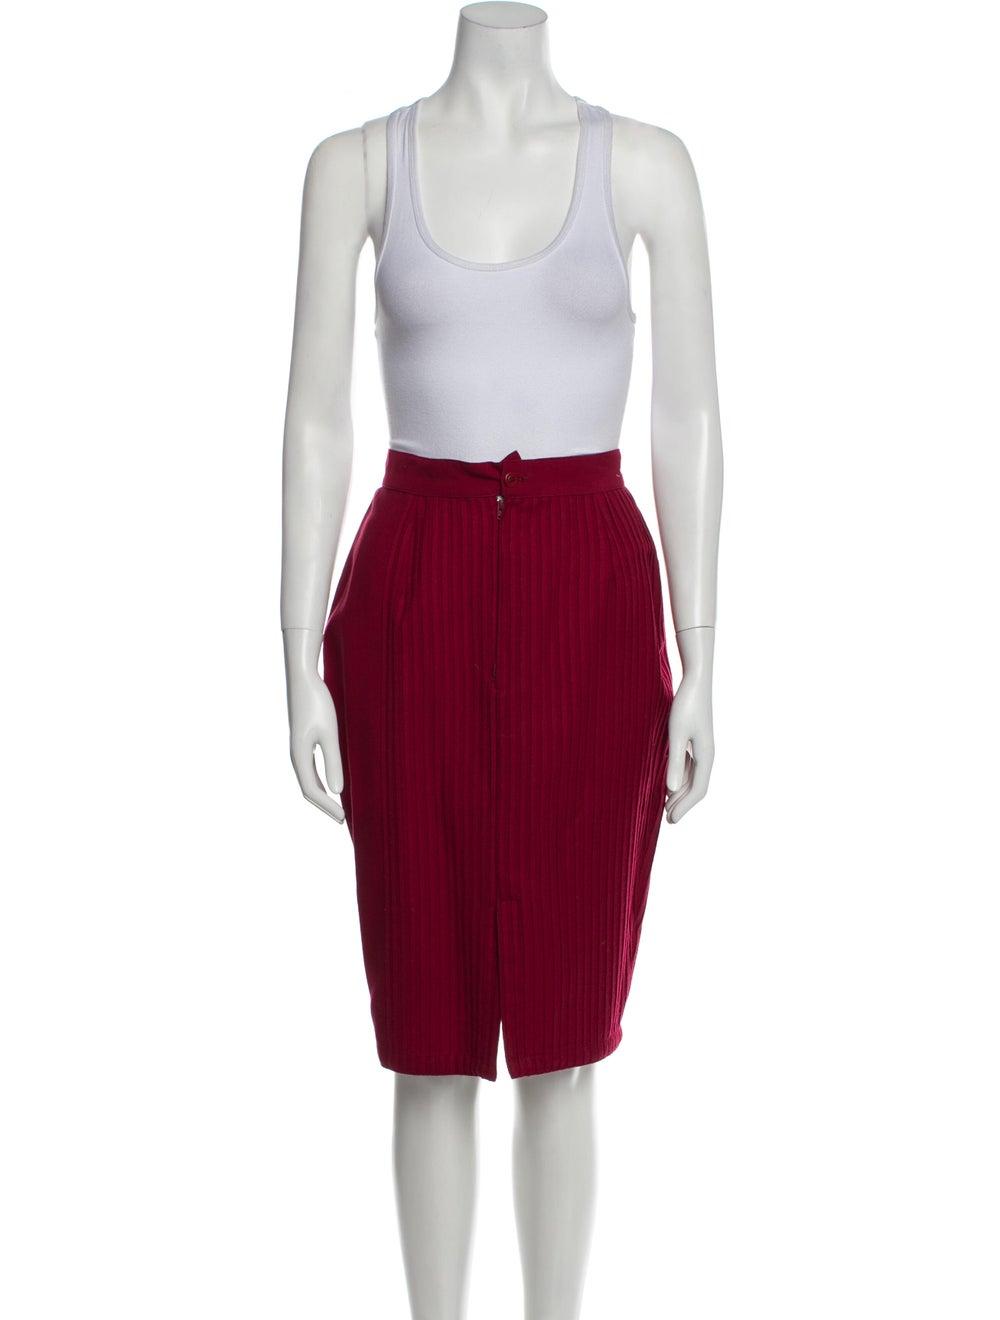 Gianni Versace Vintage 1990 Skirt Suit Wool - image 4